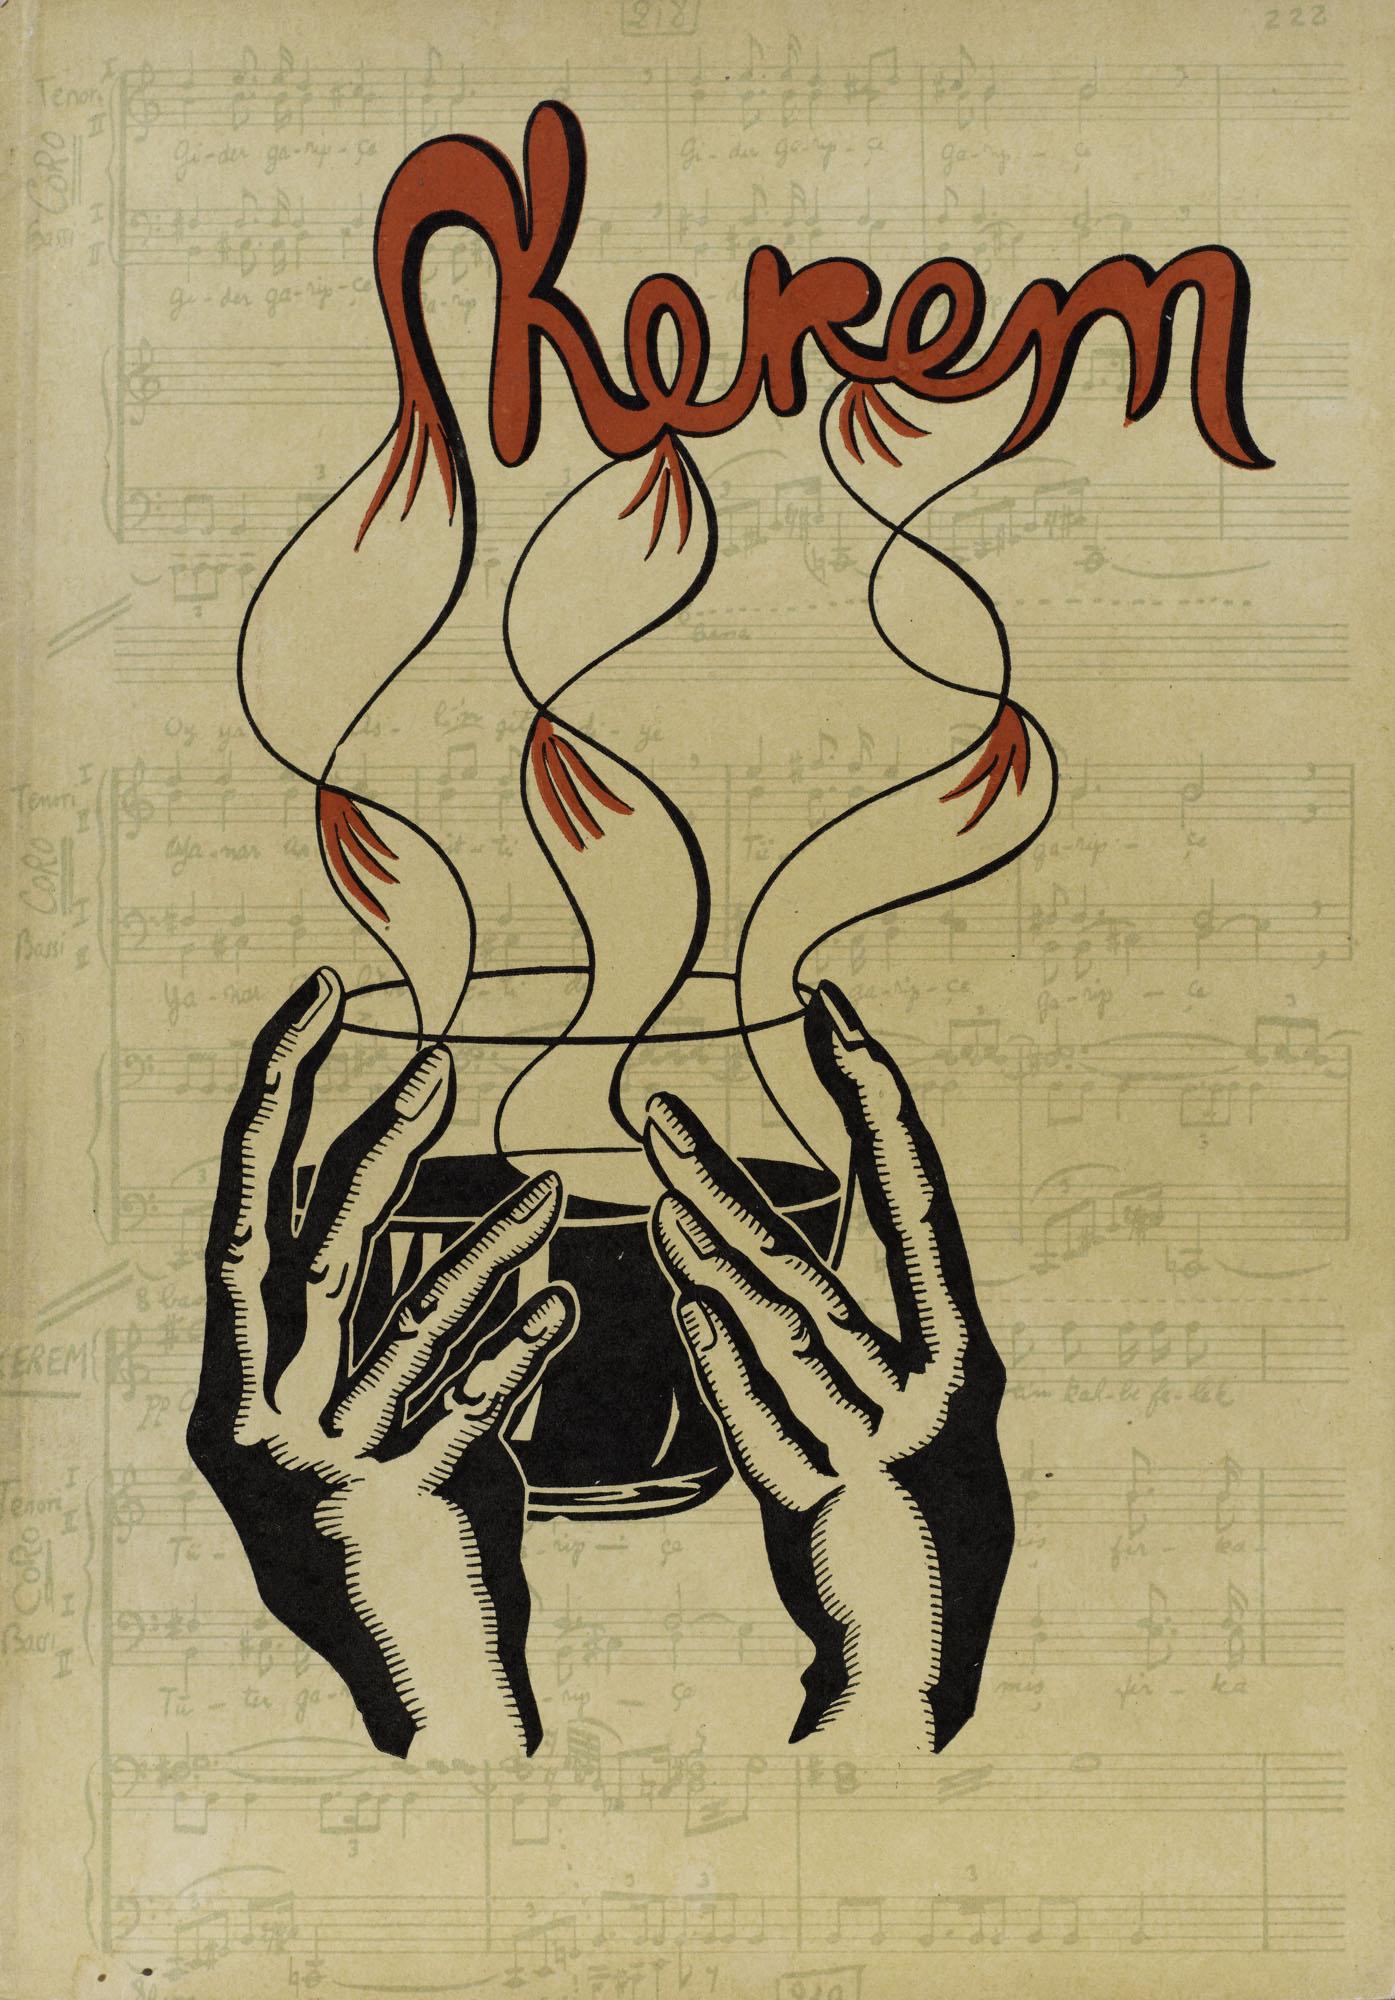 ´Kerem´ opera composed by Adnan Saygun,